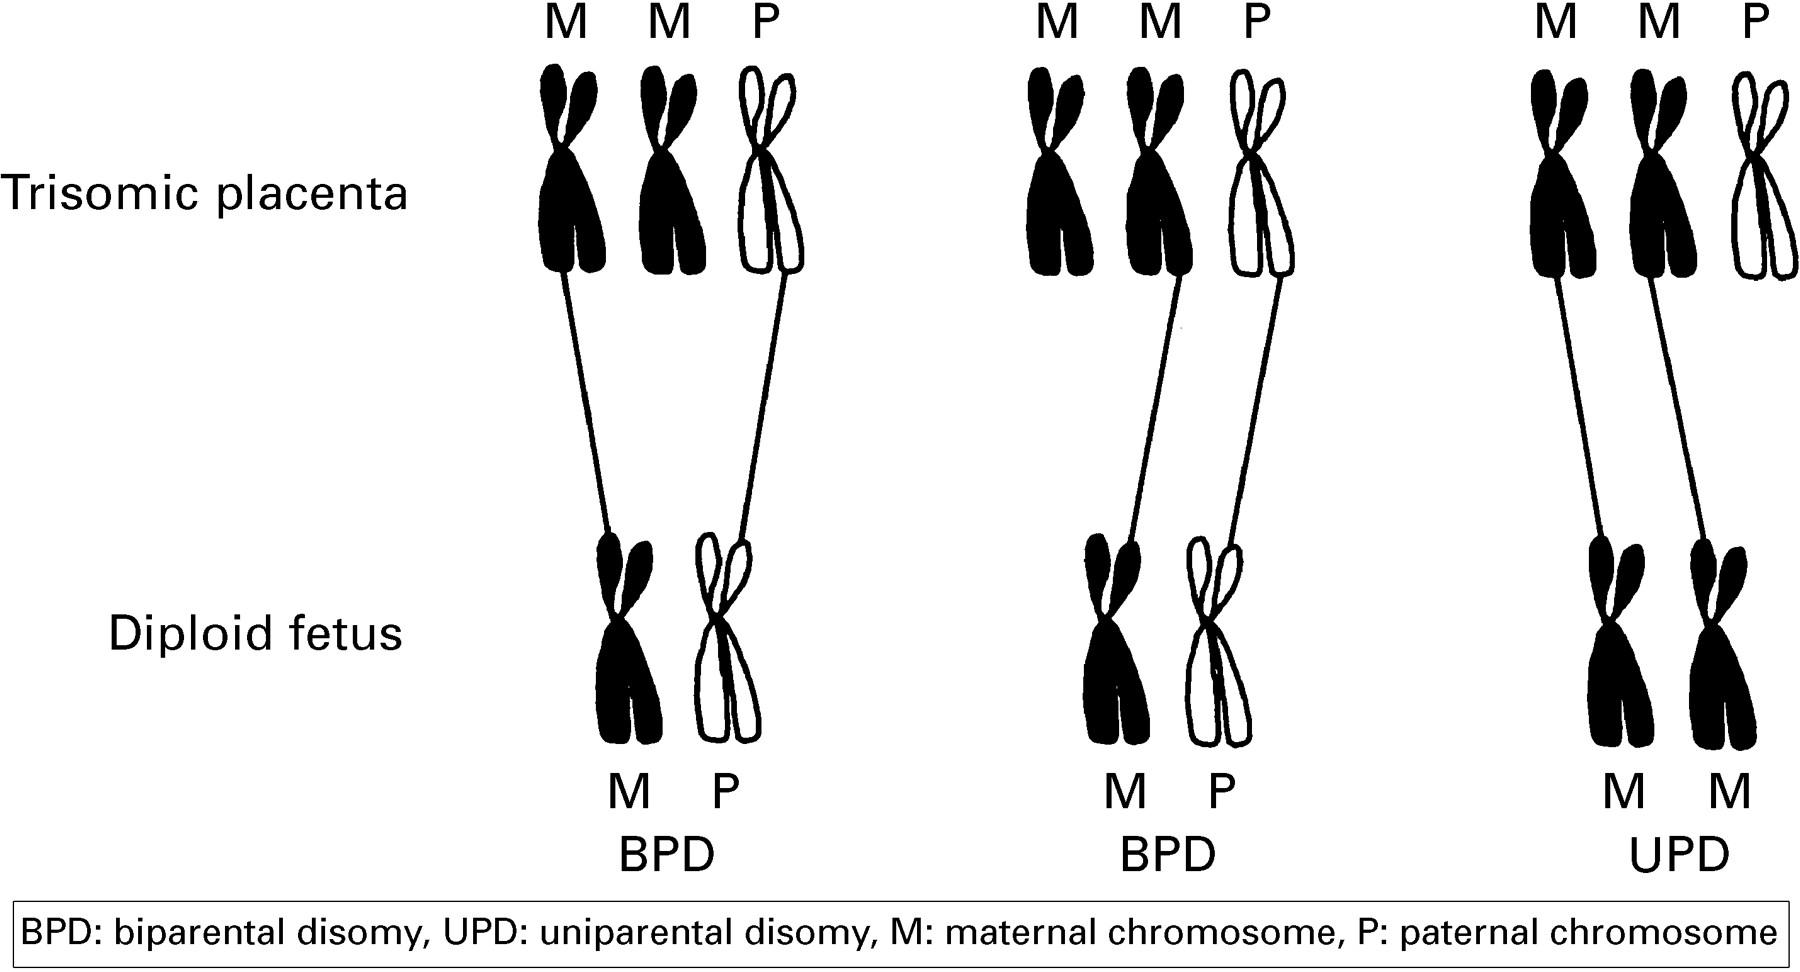 (3): F223 -- ADC - Fetal